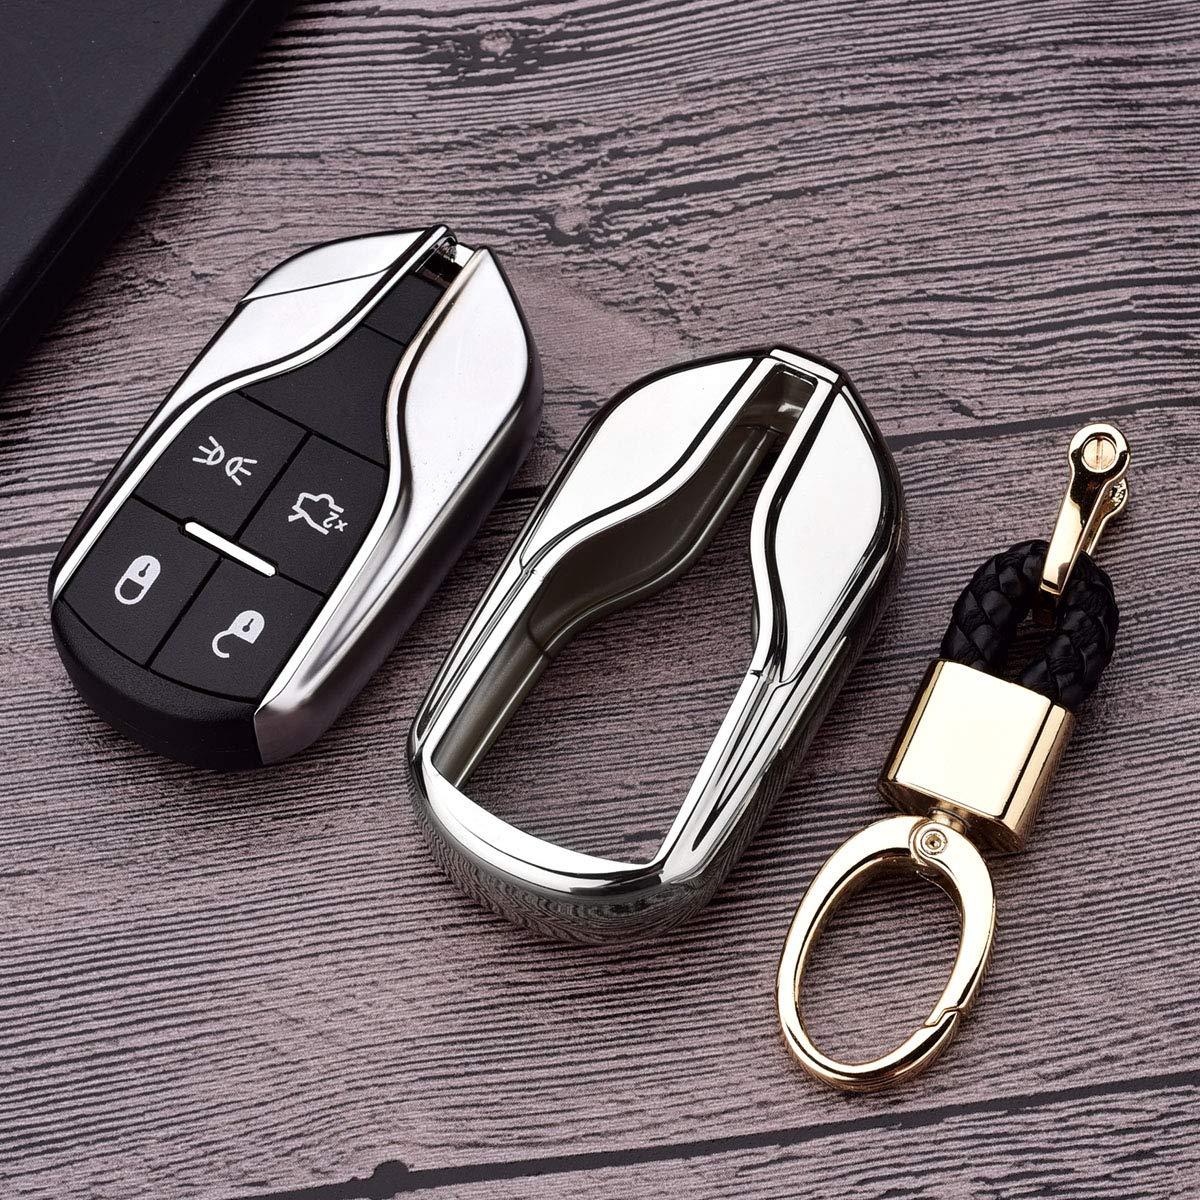 Blue TM Luxury Soft TPU Smart 4 Buttons Key Fob case Cover for Maserati Levante GT Quattroporte Ghibli Royalfox